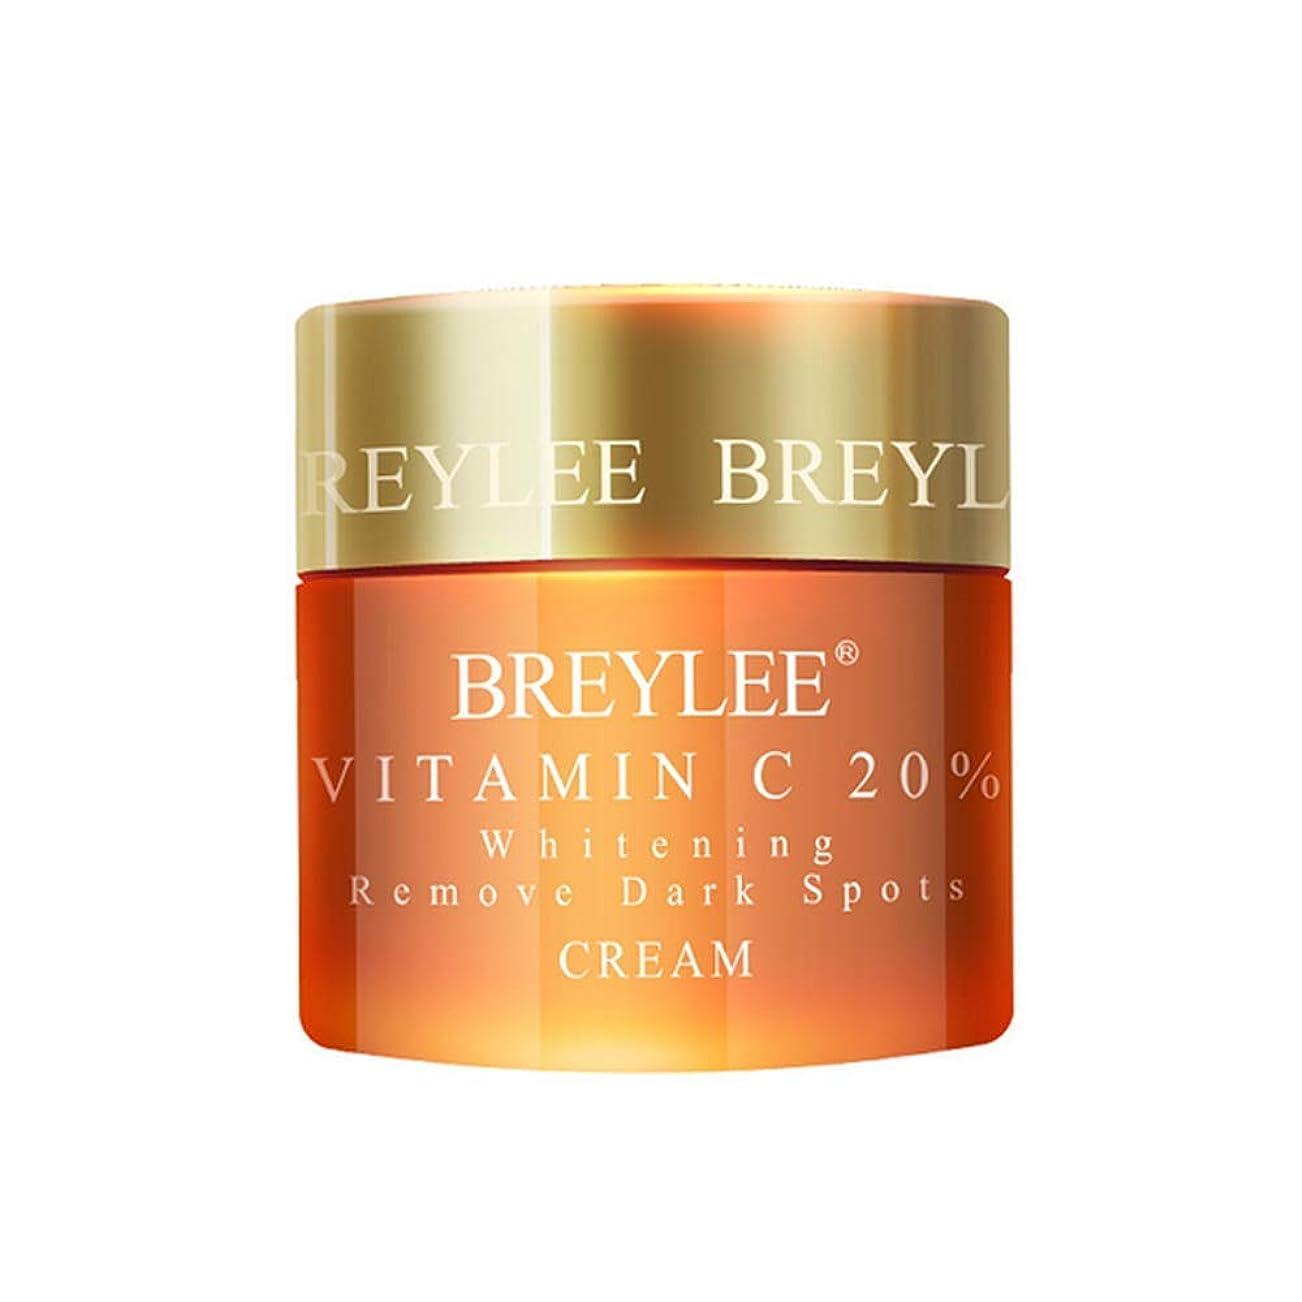 BREYLEE ヒアルロン酸 保湿クリーム 20%ビタミンC配合 美白 皮膚の引き締め (ビタミンC)